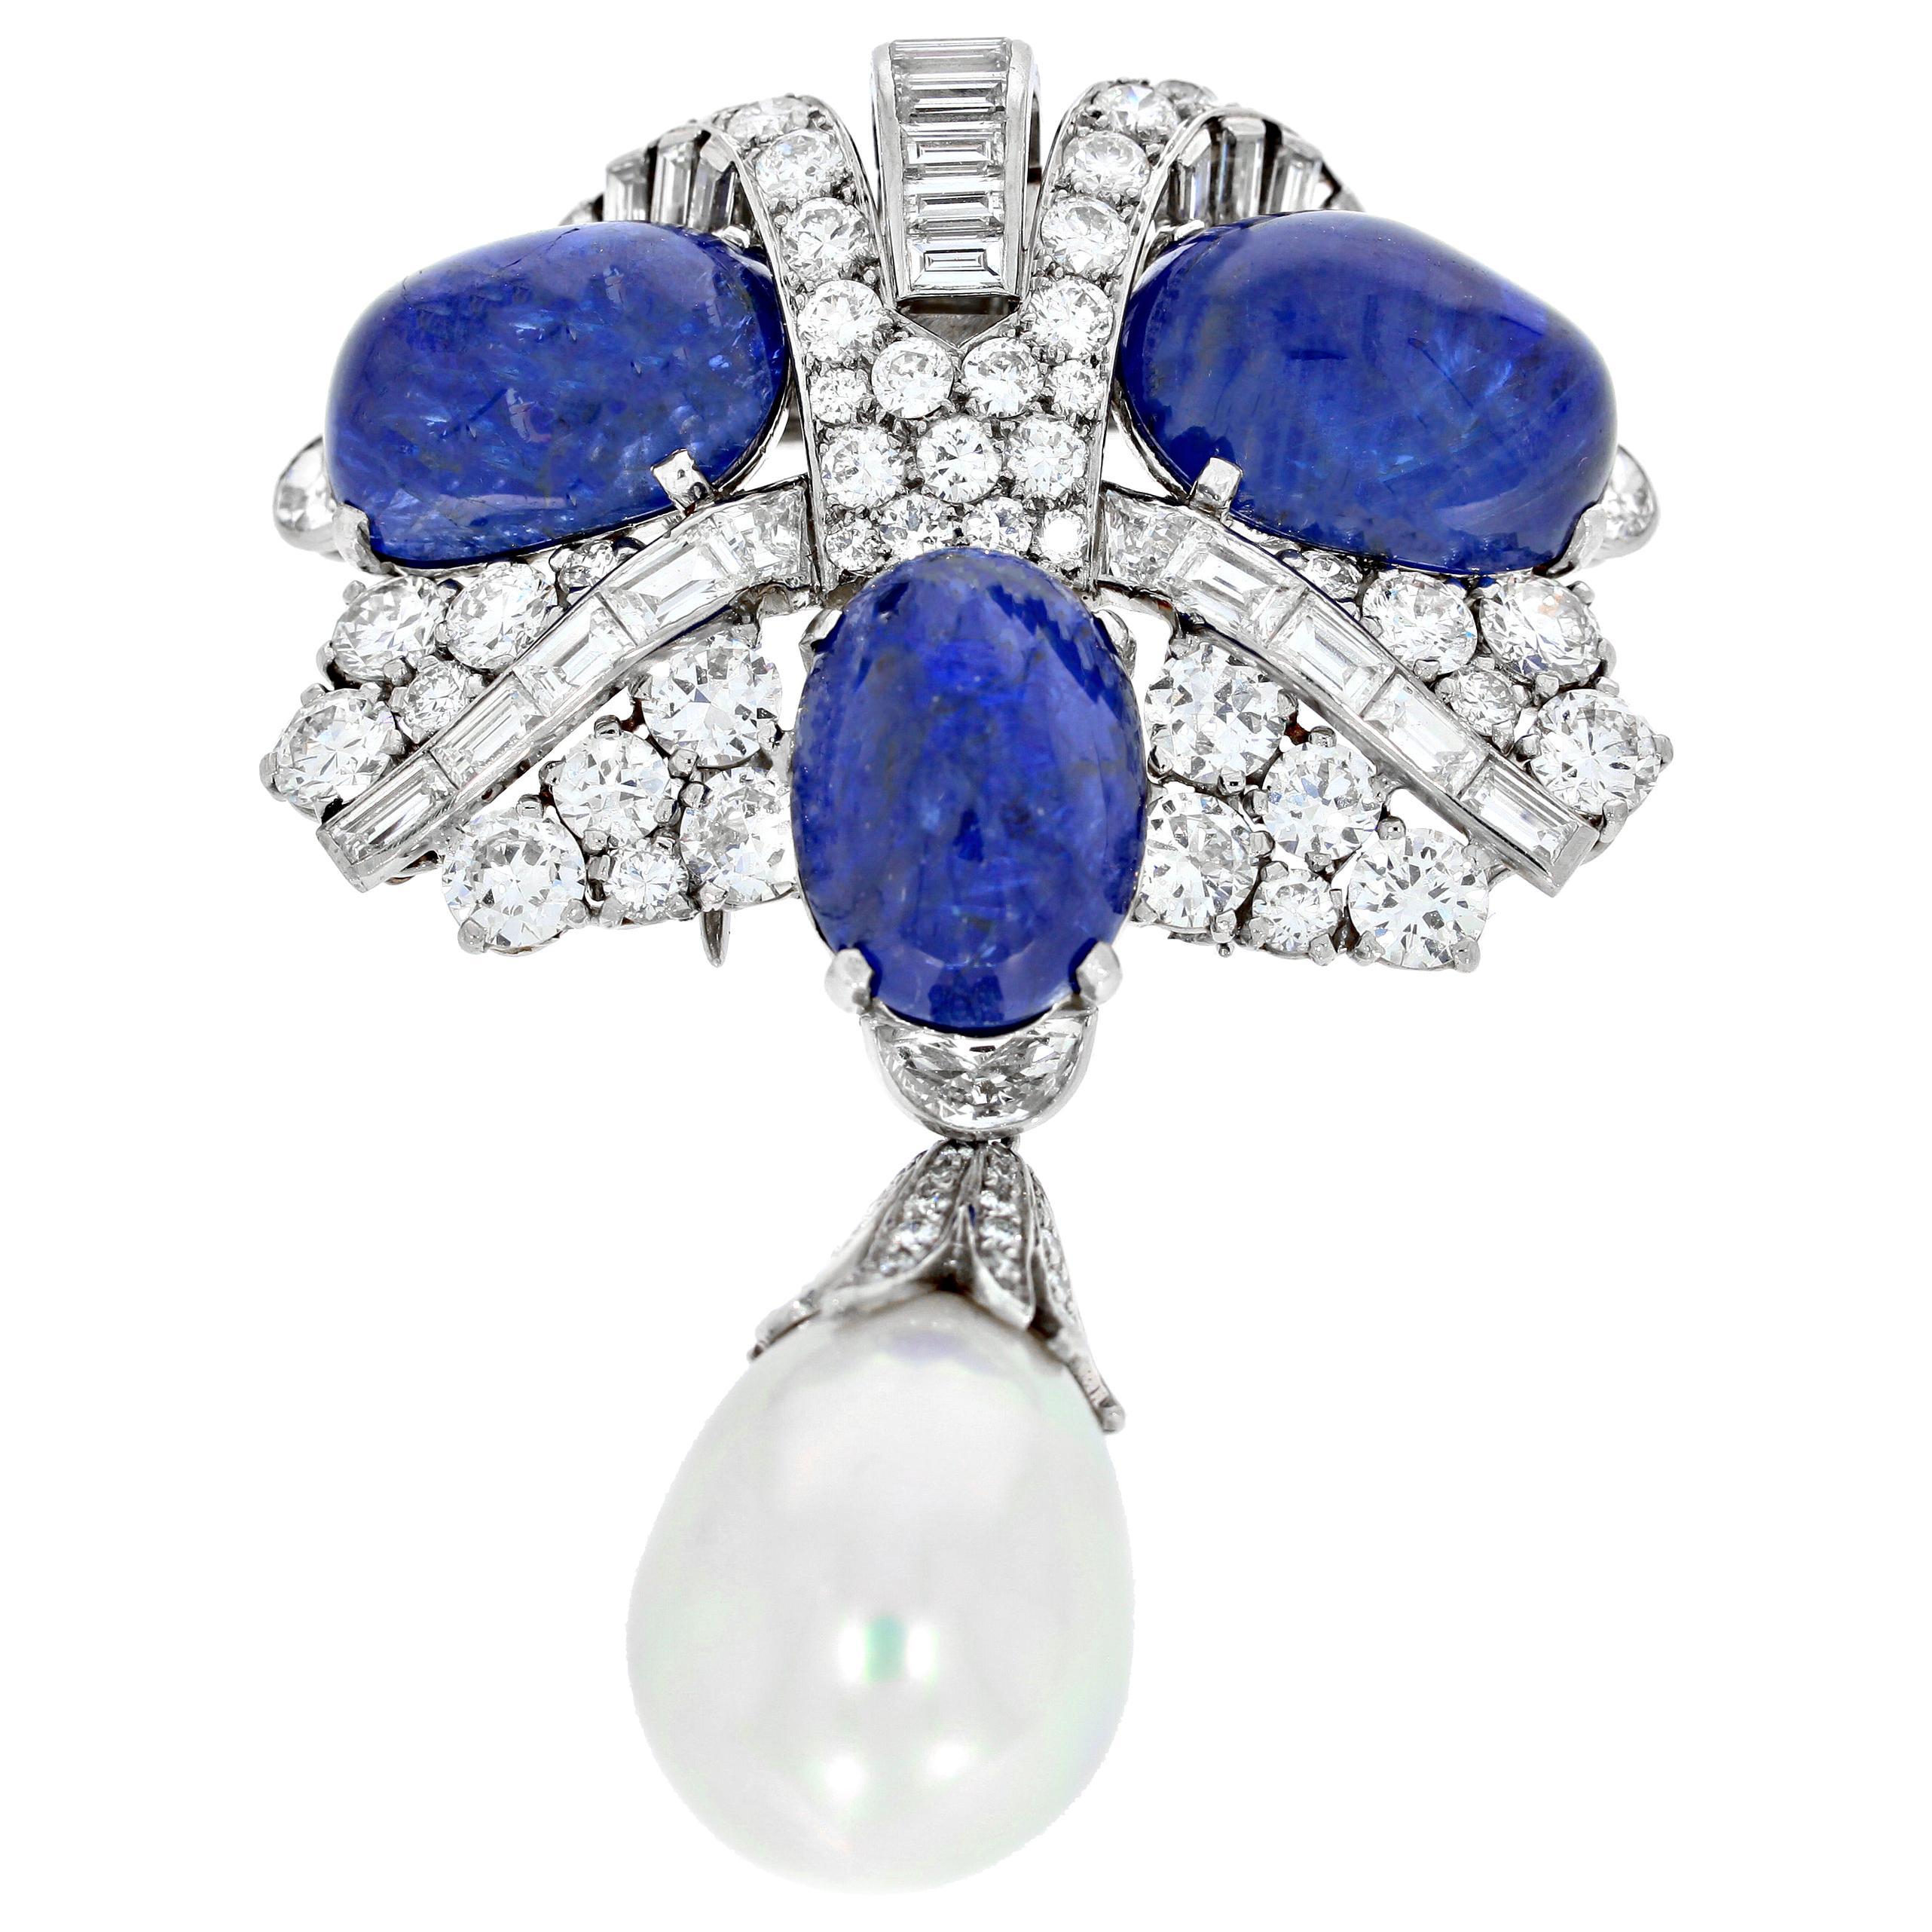 Vintage Cartier Diamond Pearl and Burma Sapphire Brooch